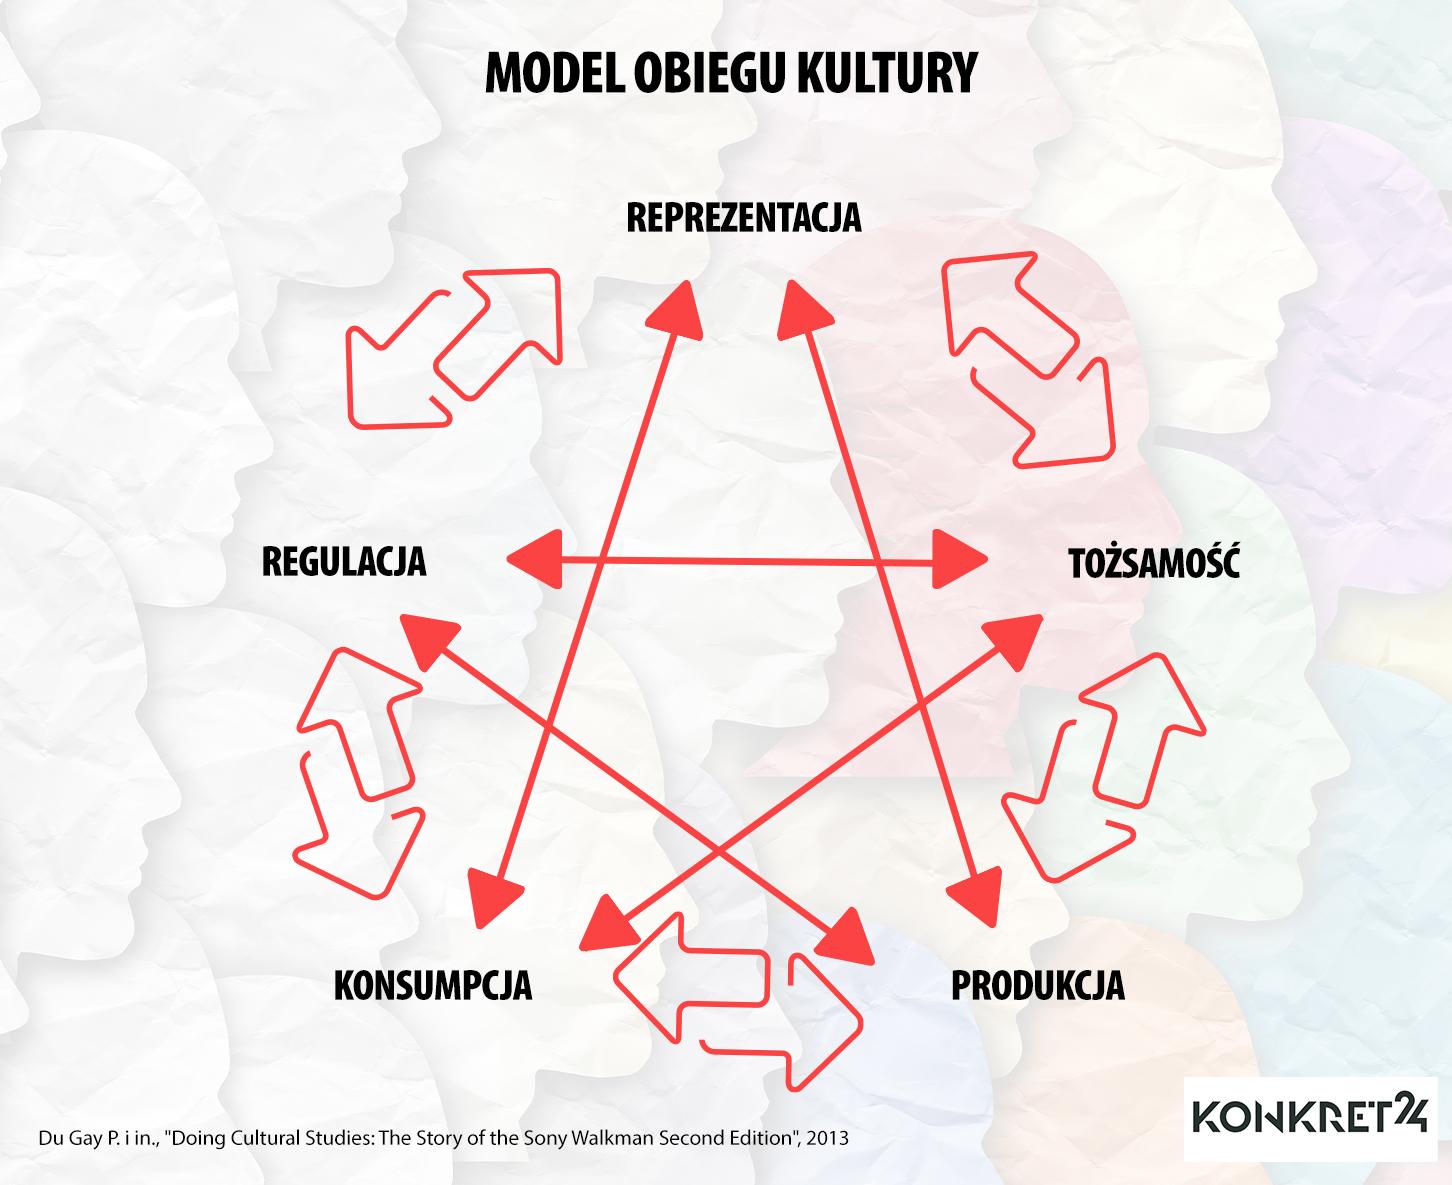 Model obiegu kultury